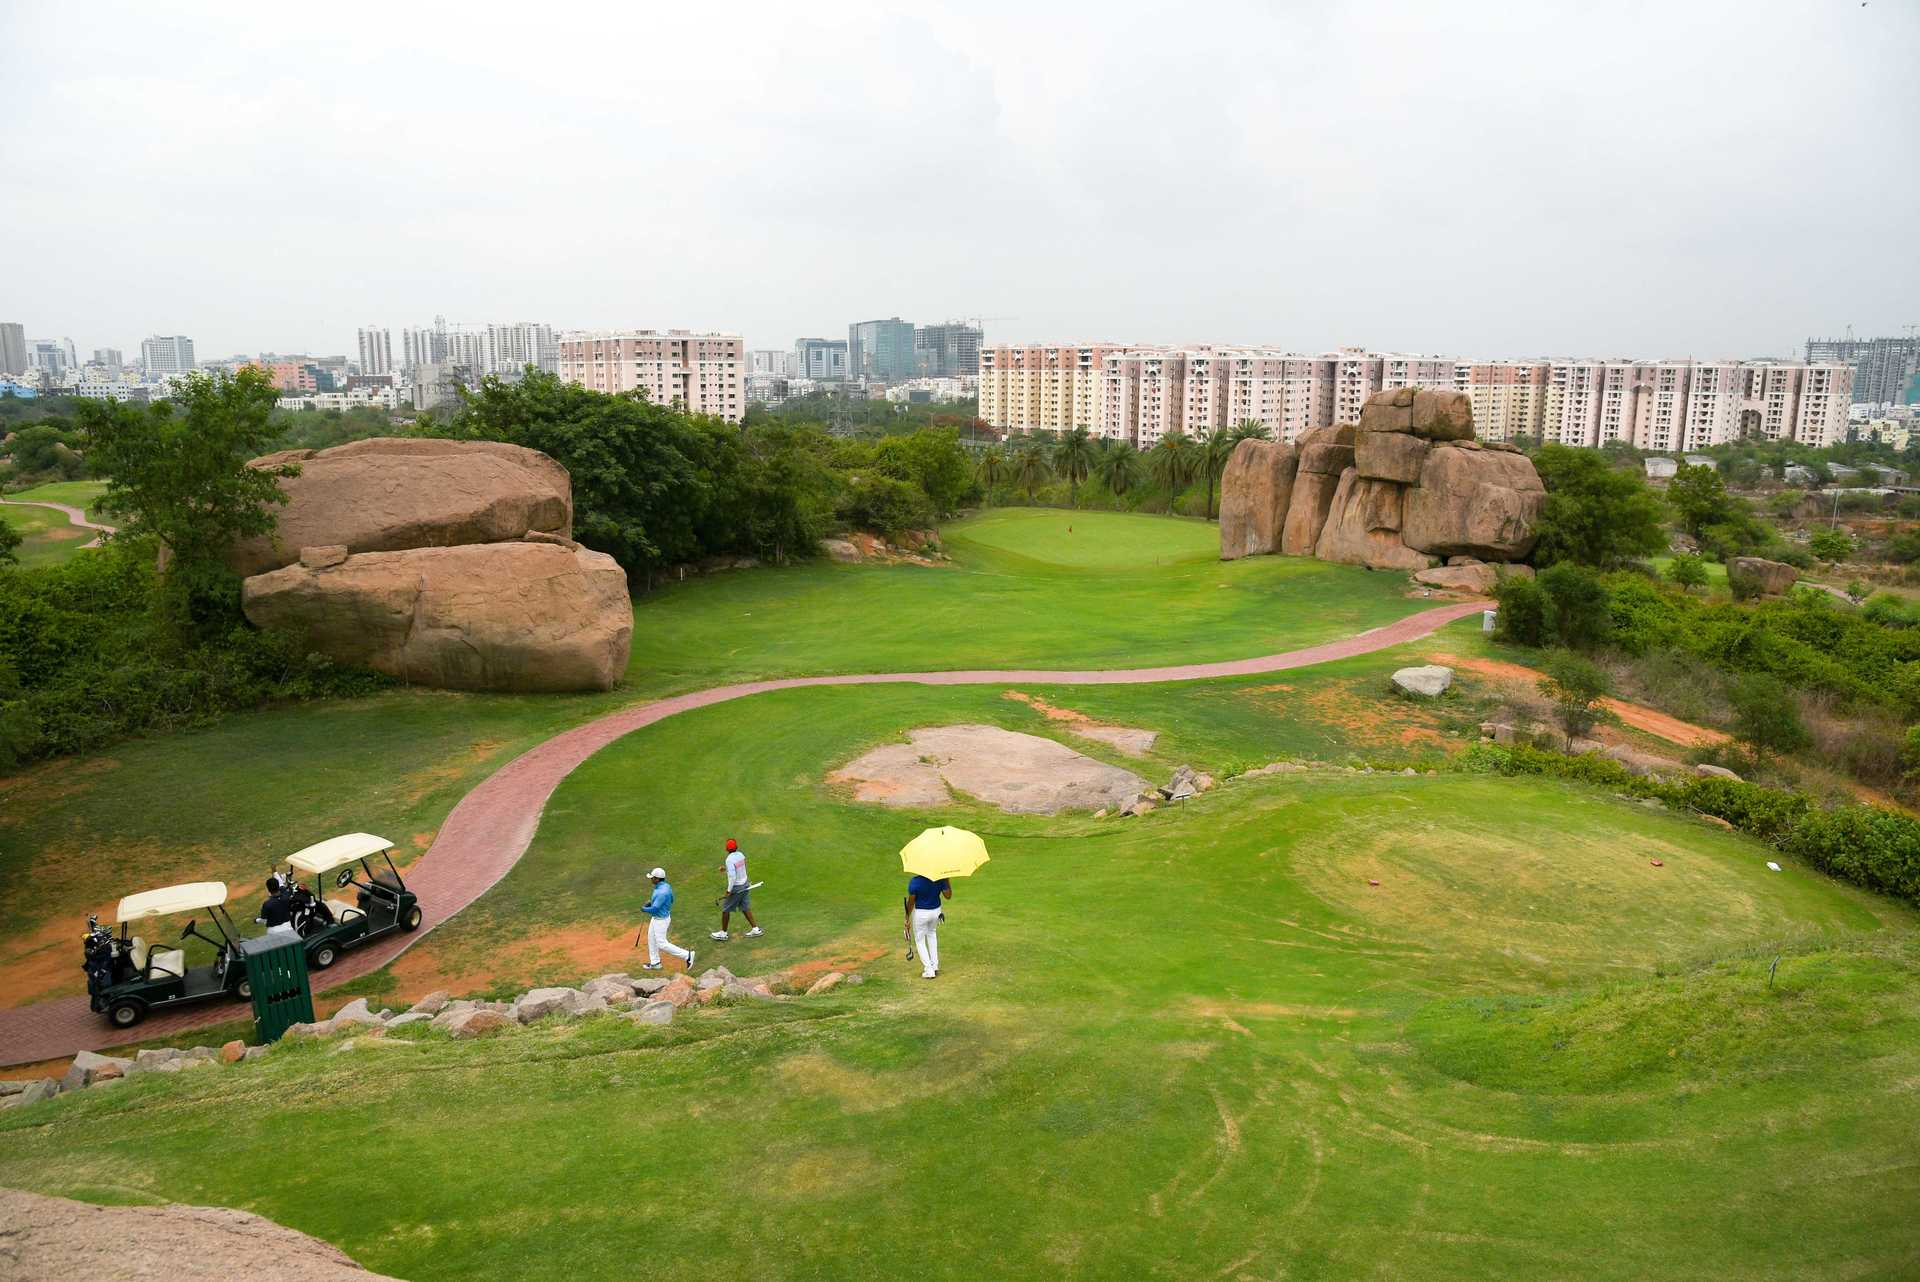 _Girlinskinnyfit_ - Golf Course-3